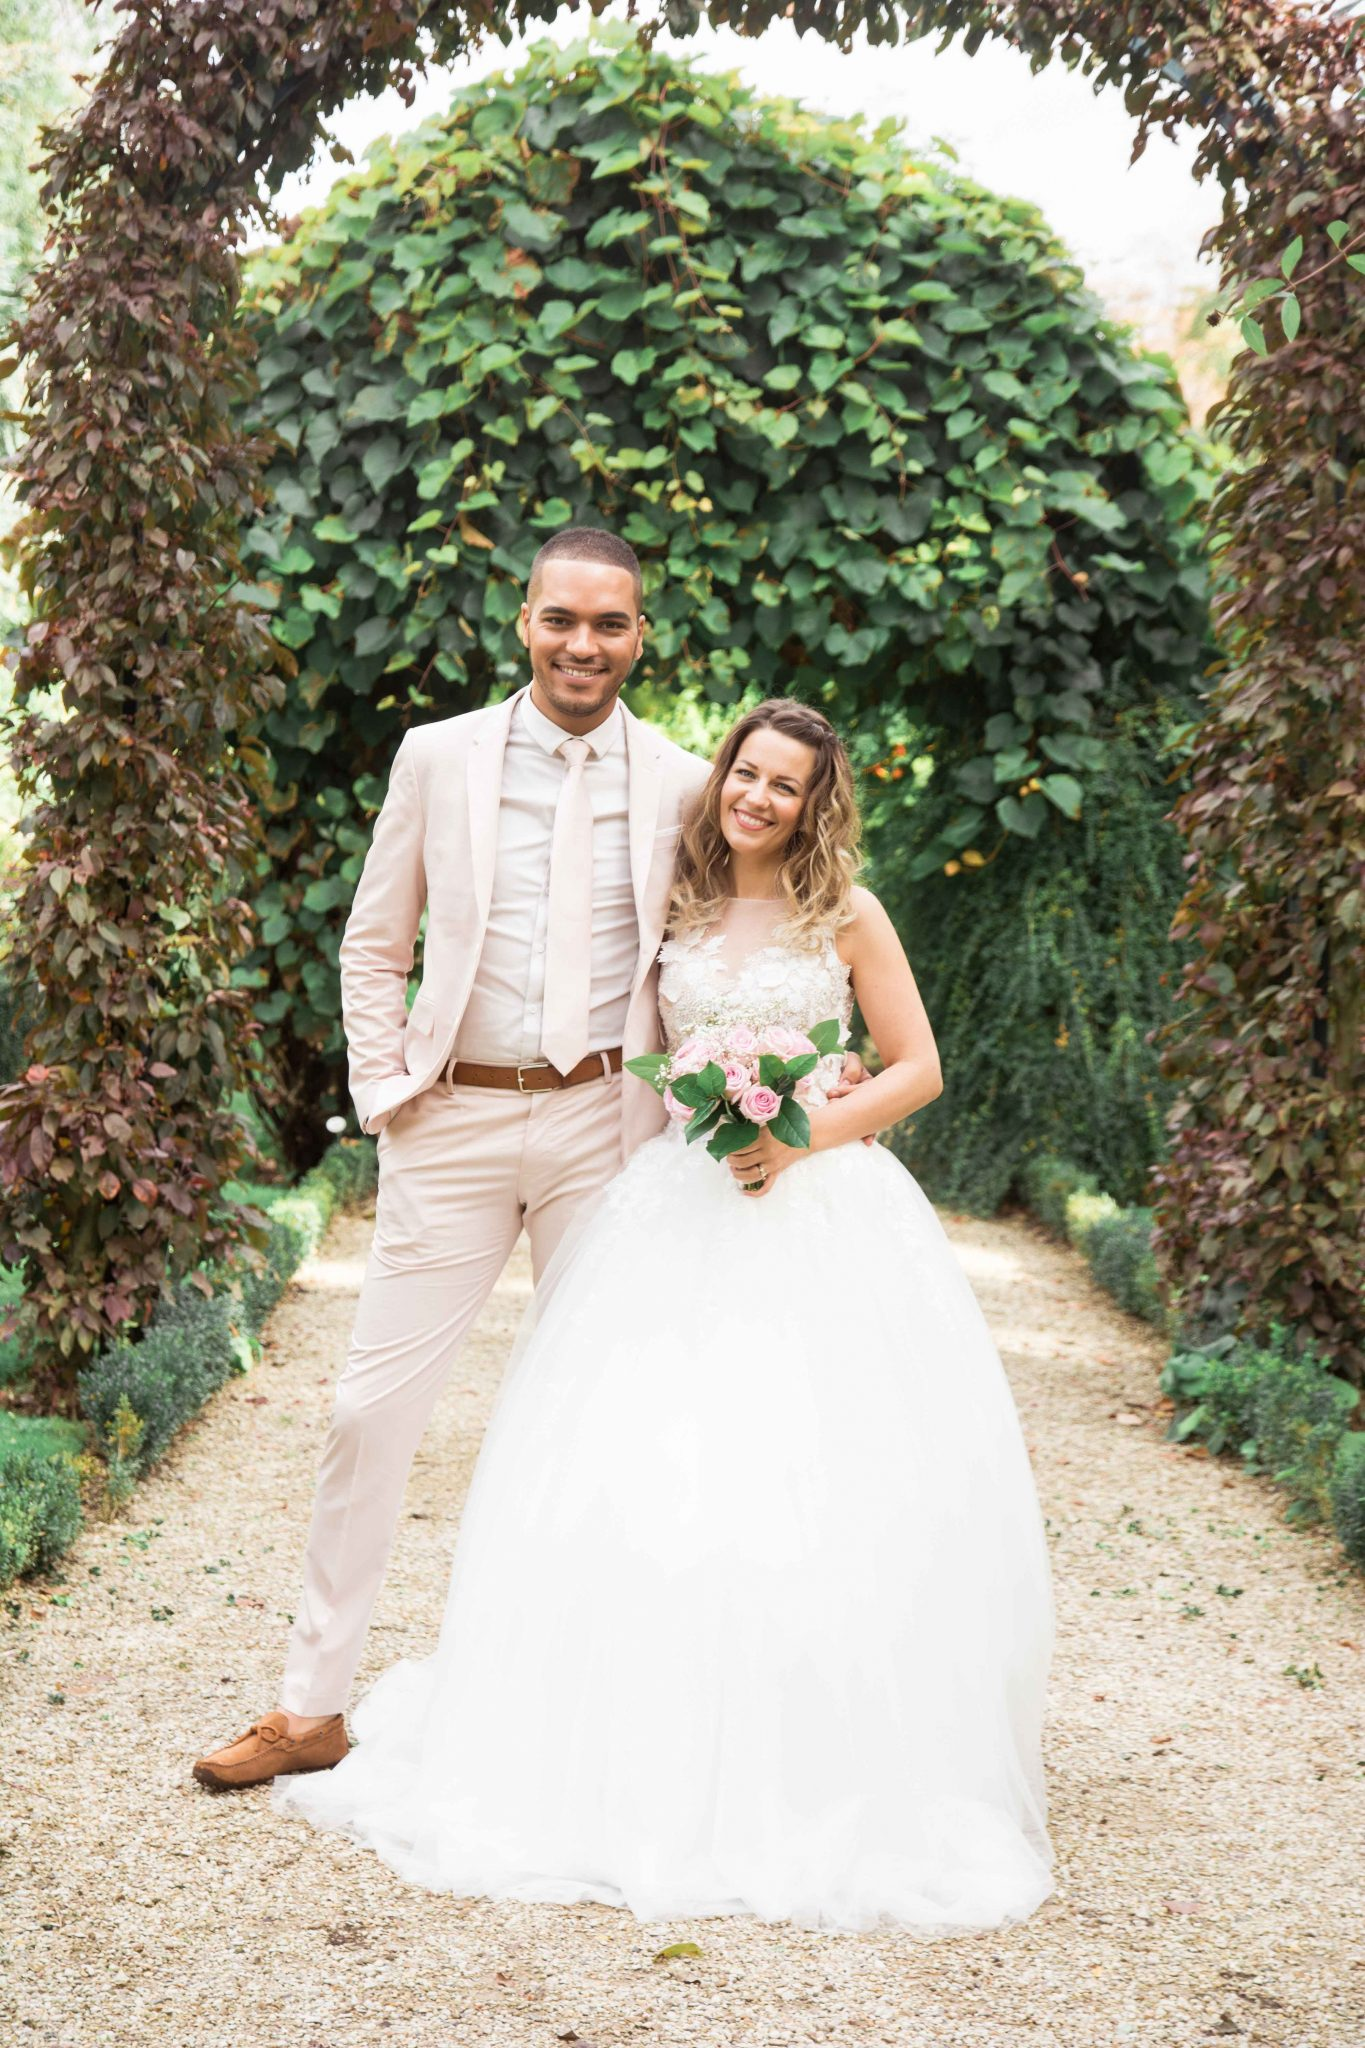 photographe mariage par bagatelle neuilly courbevoie temoins mariage naissance. Black Bedroom Furniture Sets. Home Design Ideas